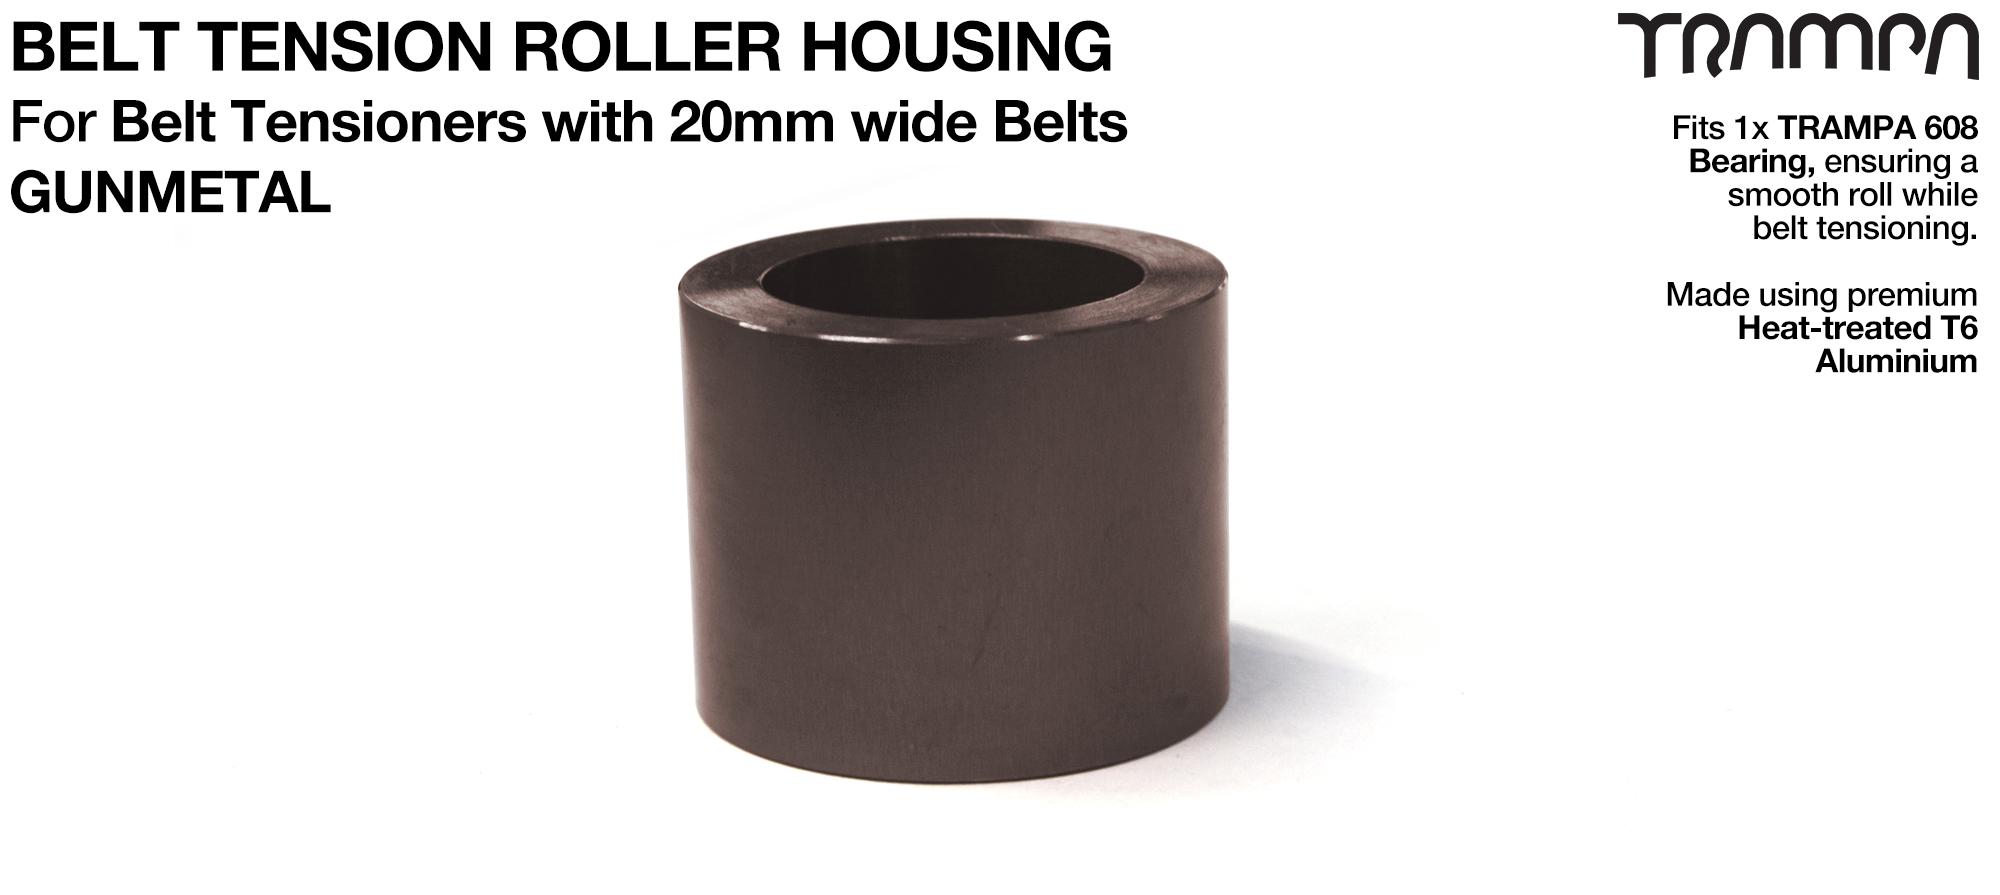 Belt Tension Roller Housing for 20mm Belts - GUNMETAL